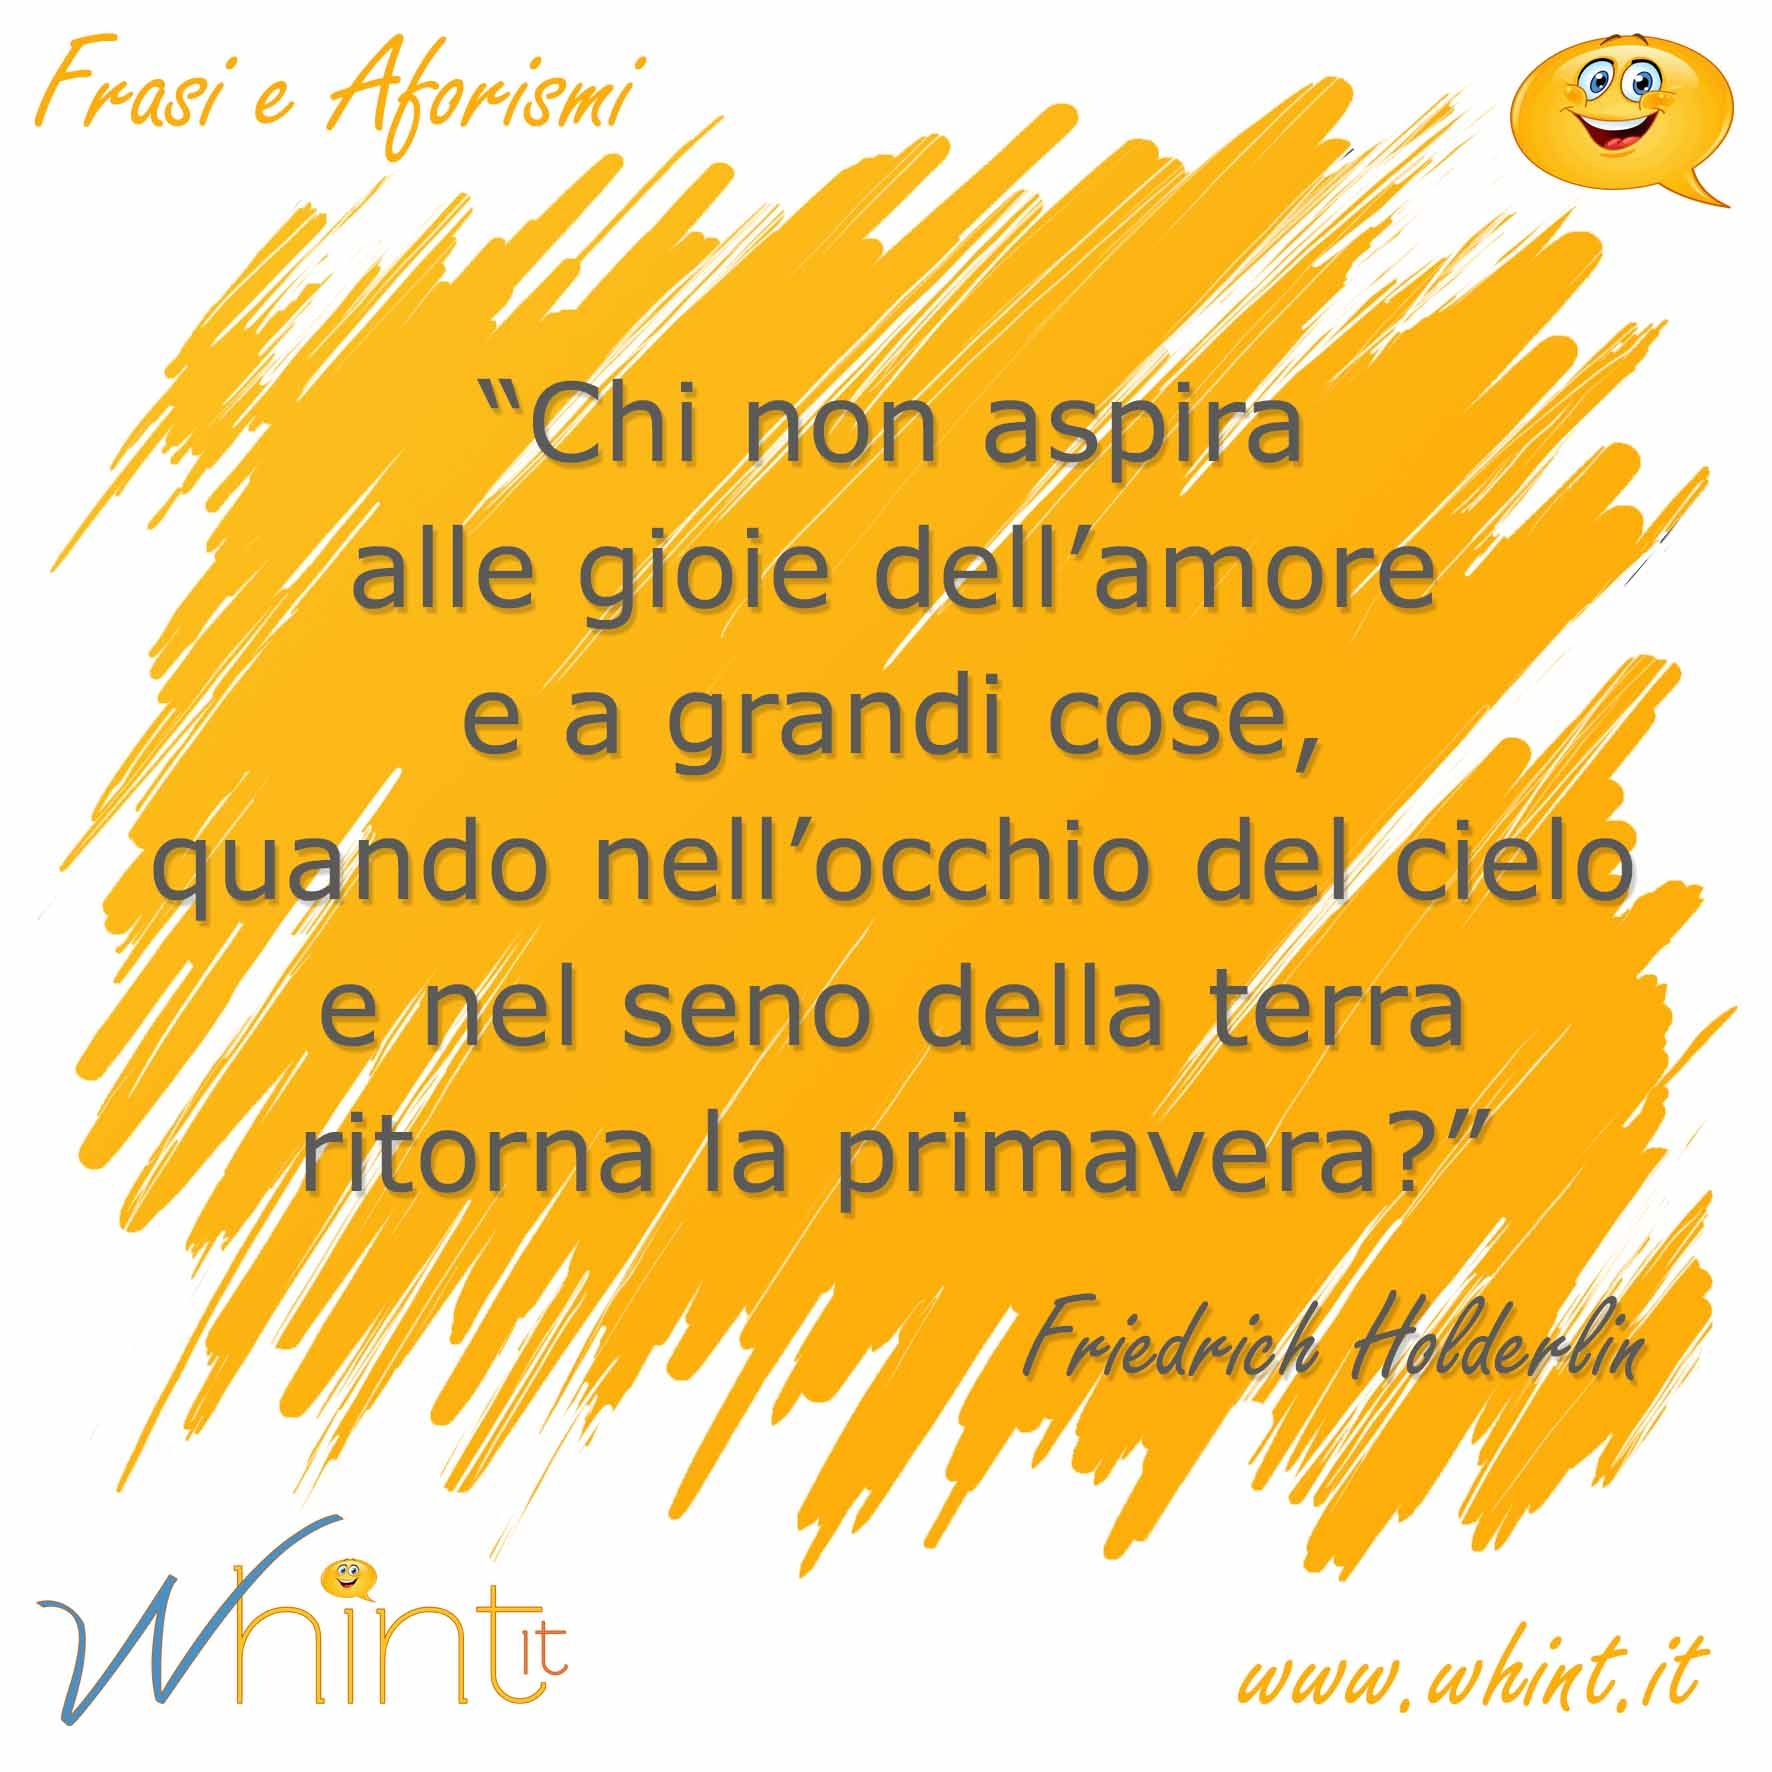 #whintit #pensopositivo #positività #positivo #positivamente #ottimismo #frasi #aforismi #frasicelebri #frasifamose #buongiorno